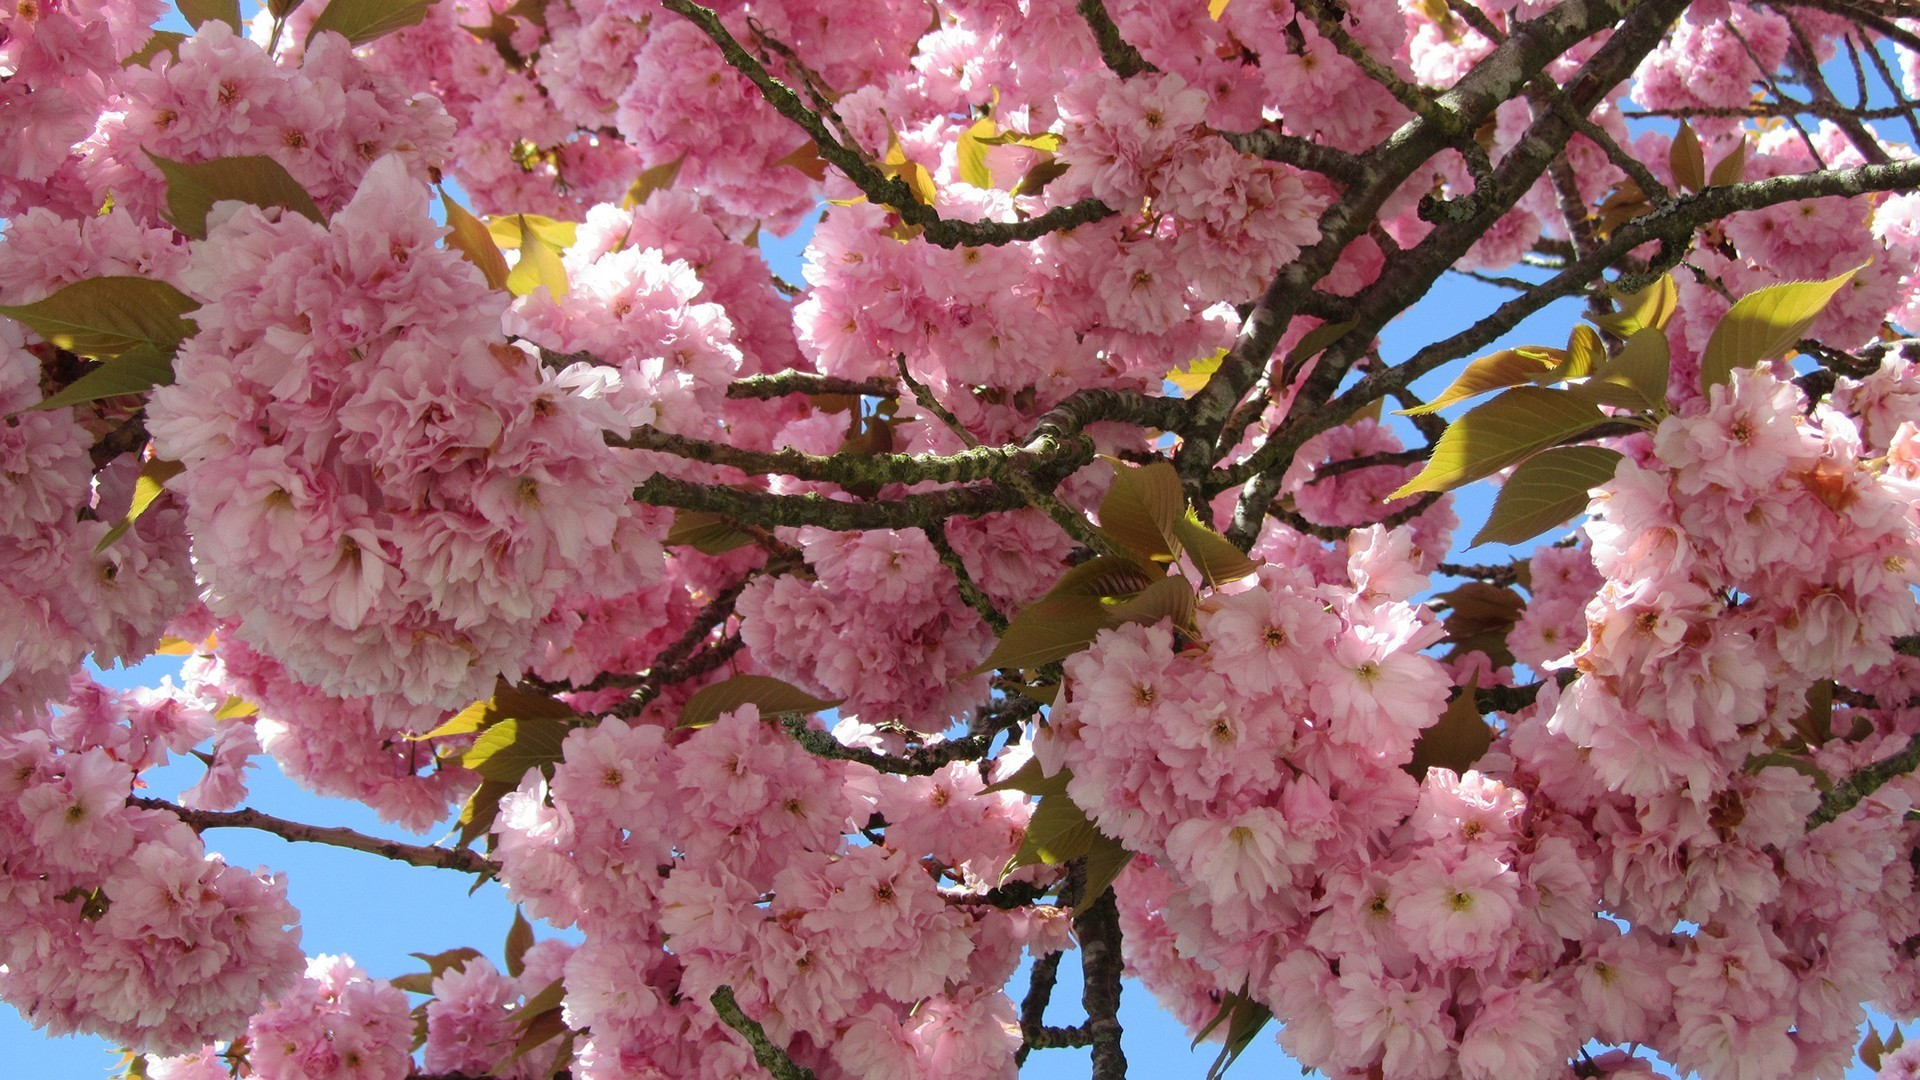 … natur flower pink cherry blossom sakura desktop wallpaper hd …